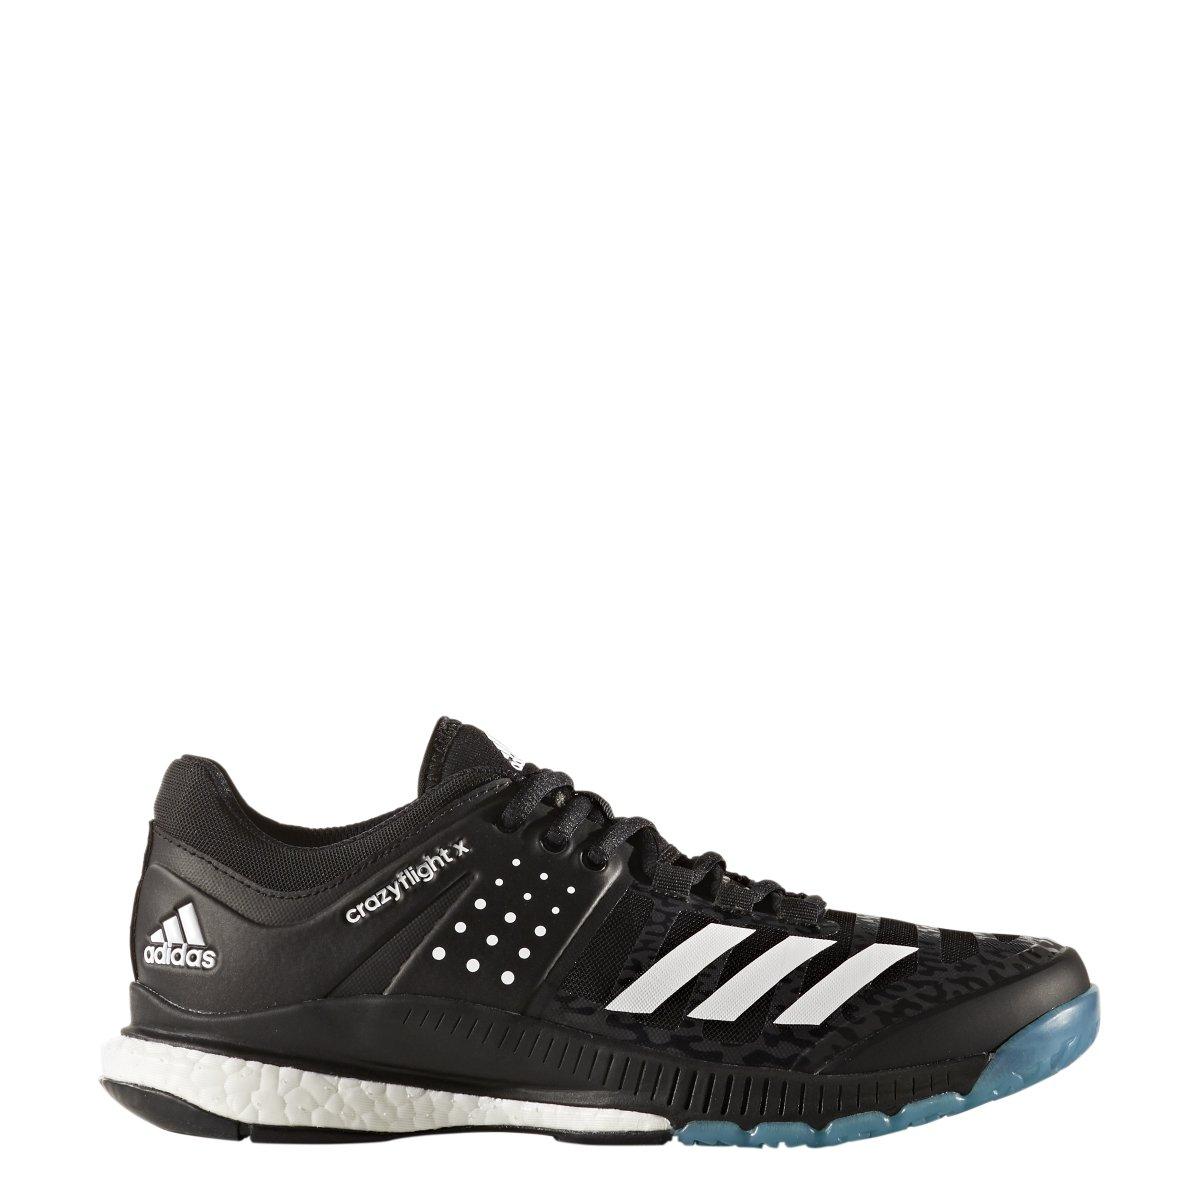 965803d98 Amazon.com | adidas Originals Women's Crazyflight X Volleyball Shoe |  Fitness & Cross-Training